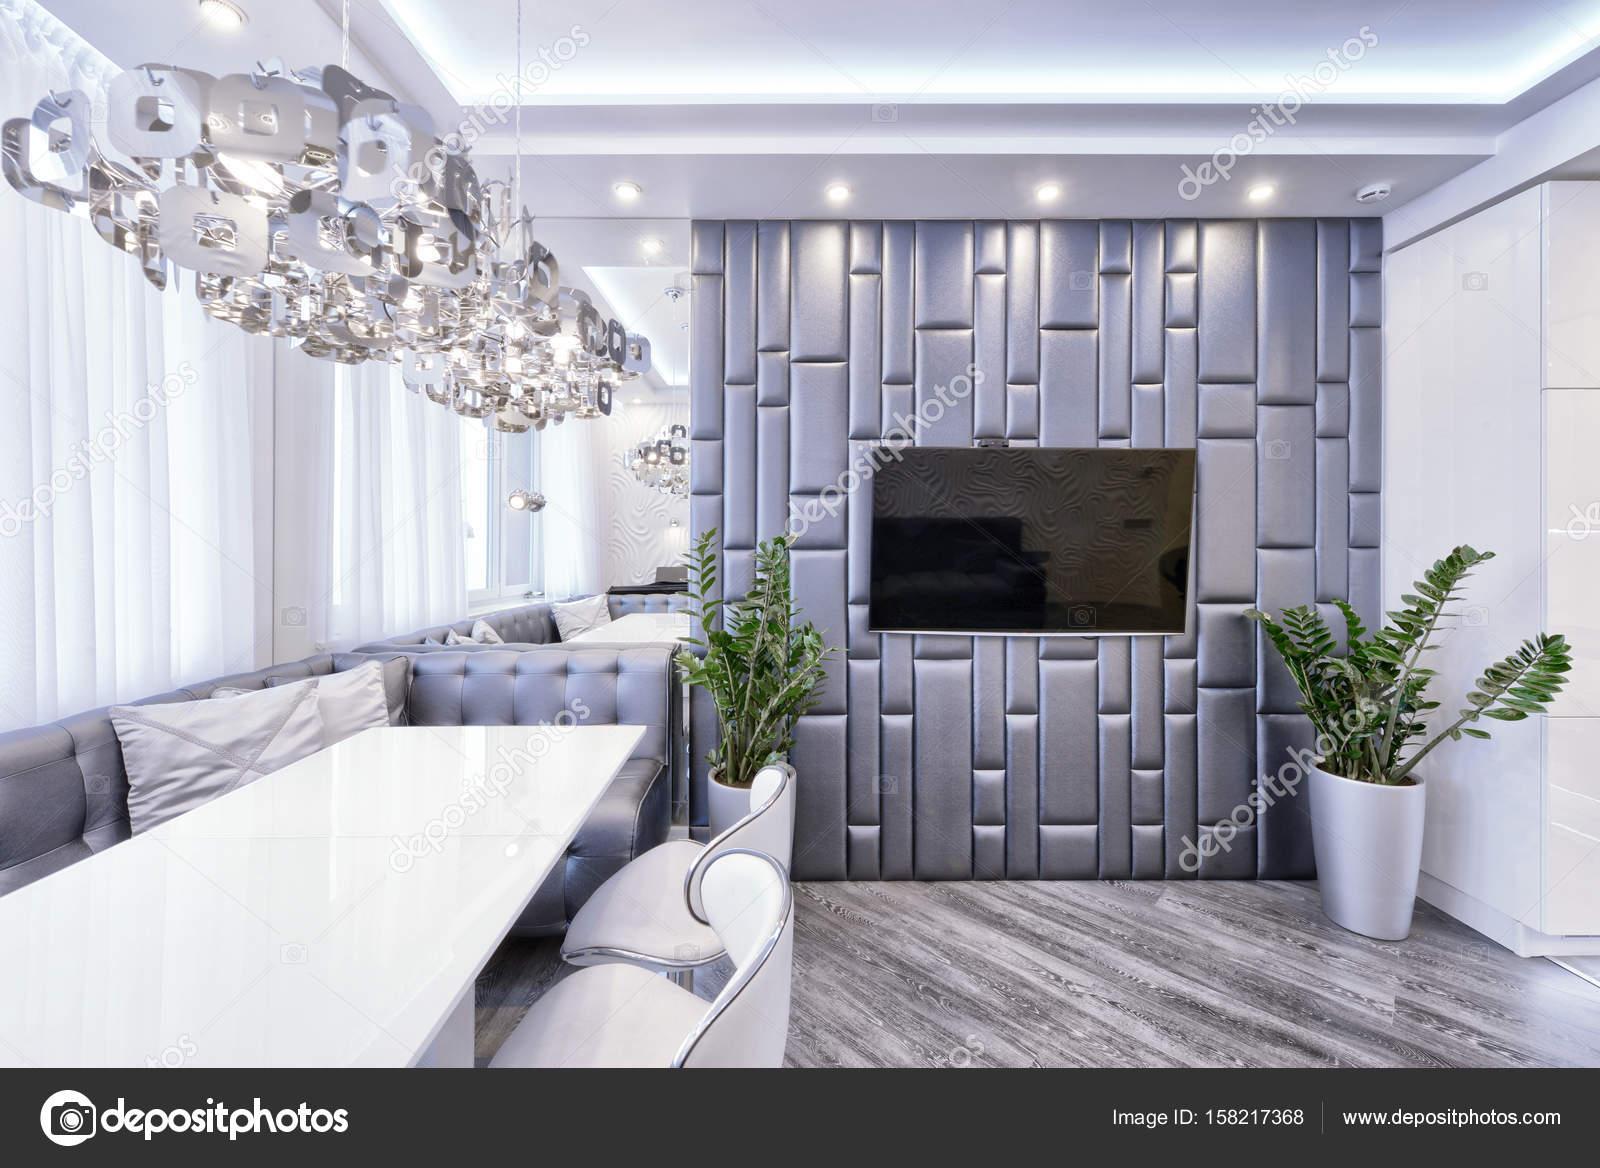 https://st3.depositphotos.com/4730441/15821/i/1600/depositphotos_158217368-stockafbeelding-moderne-design-interieur-van-woonkamer.jpg